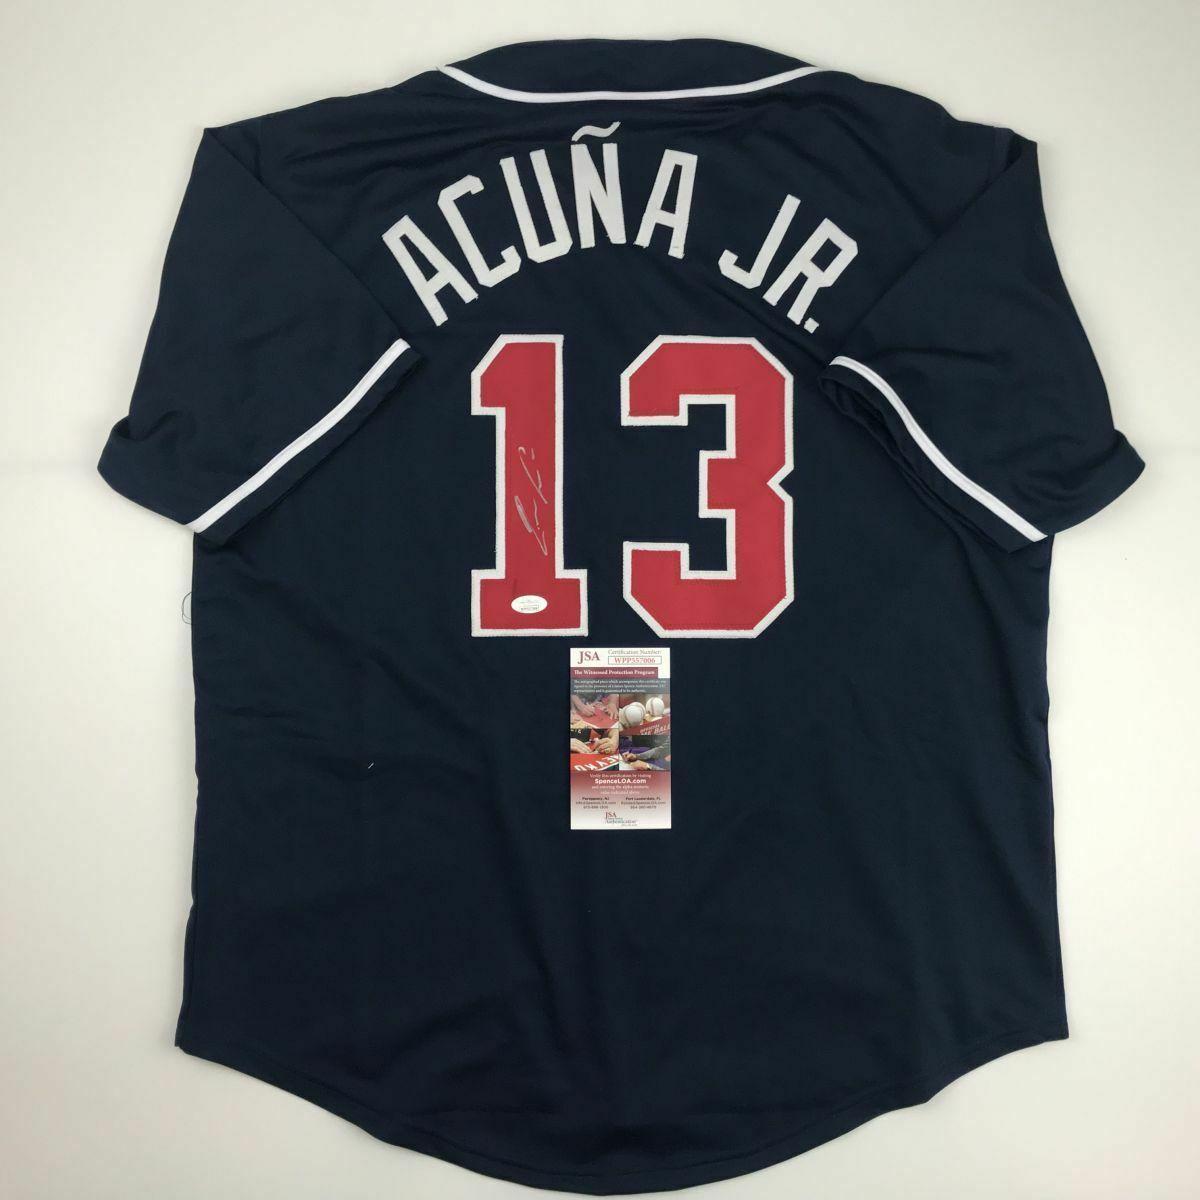 Autographed/Signed RONALD ACUNA JR. Atlanta Blue Baseball Jersey JSA COA Auto image 2